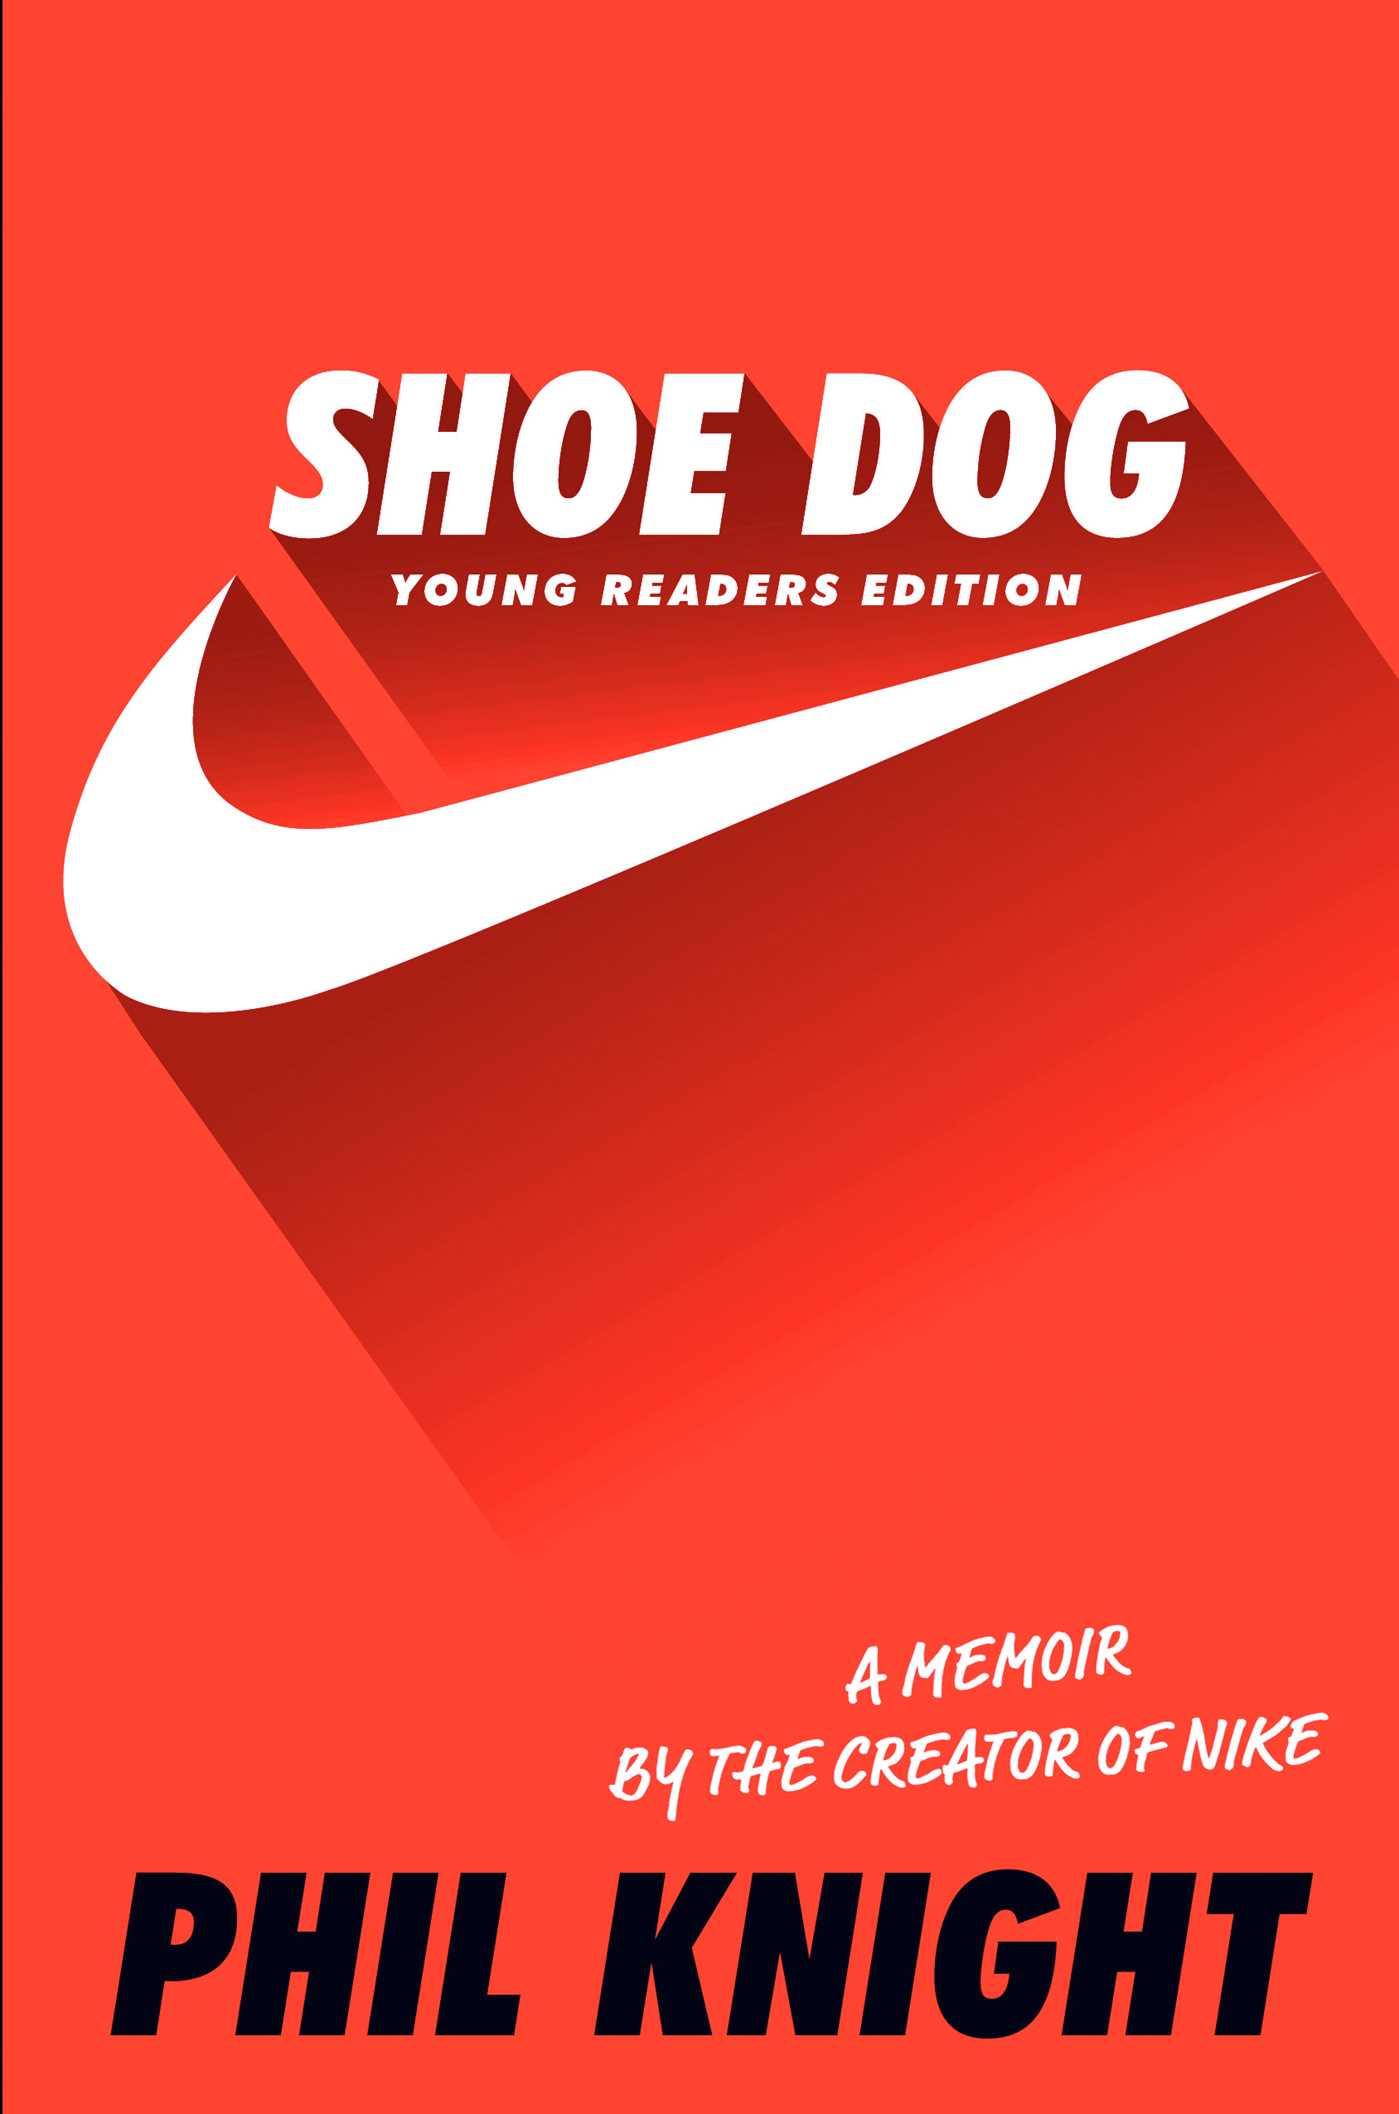 Shoe dog 9781534401181 hr